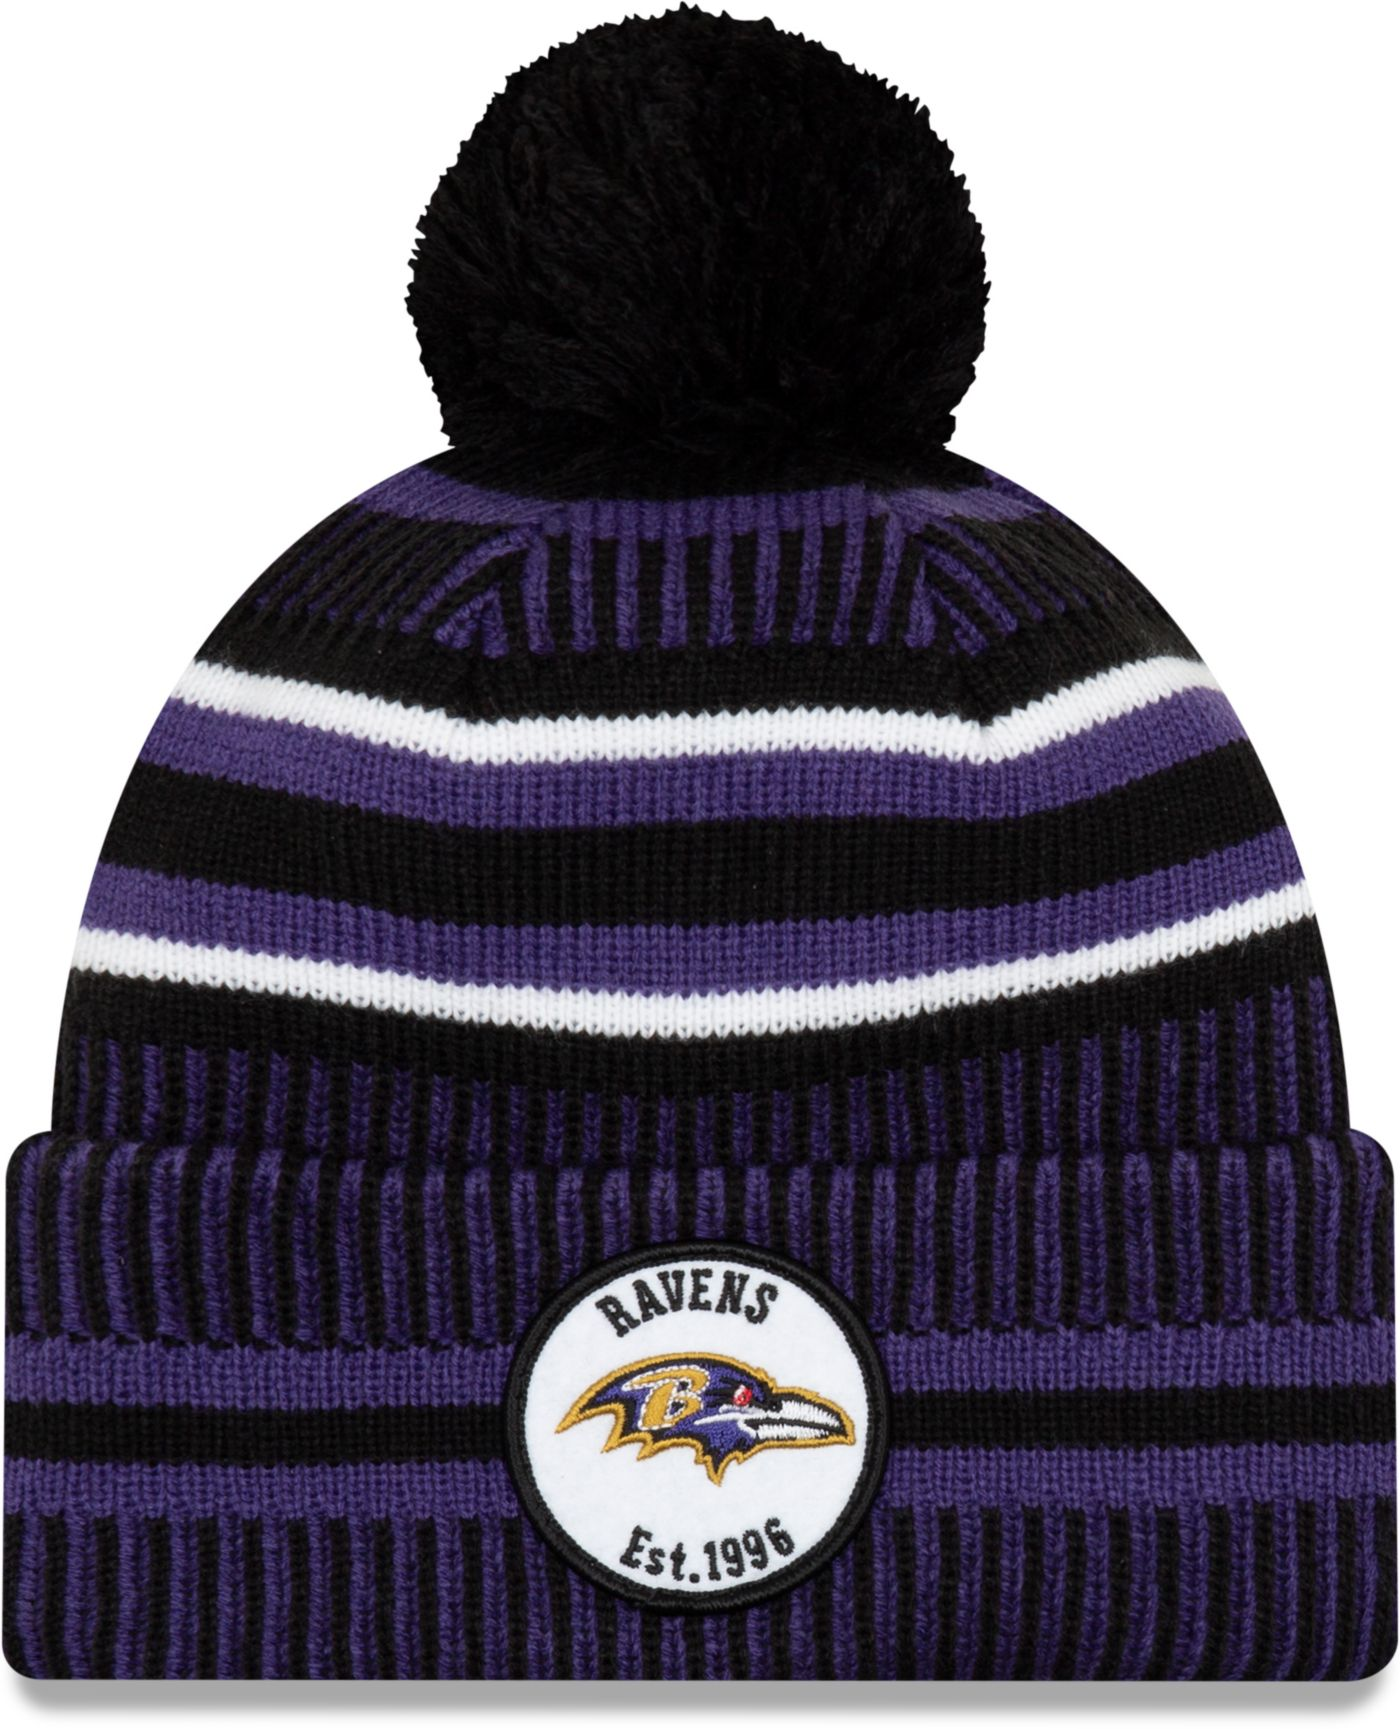 New Era Men's Baltimore Ravens Sideline Home Sport Pom Knit